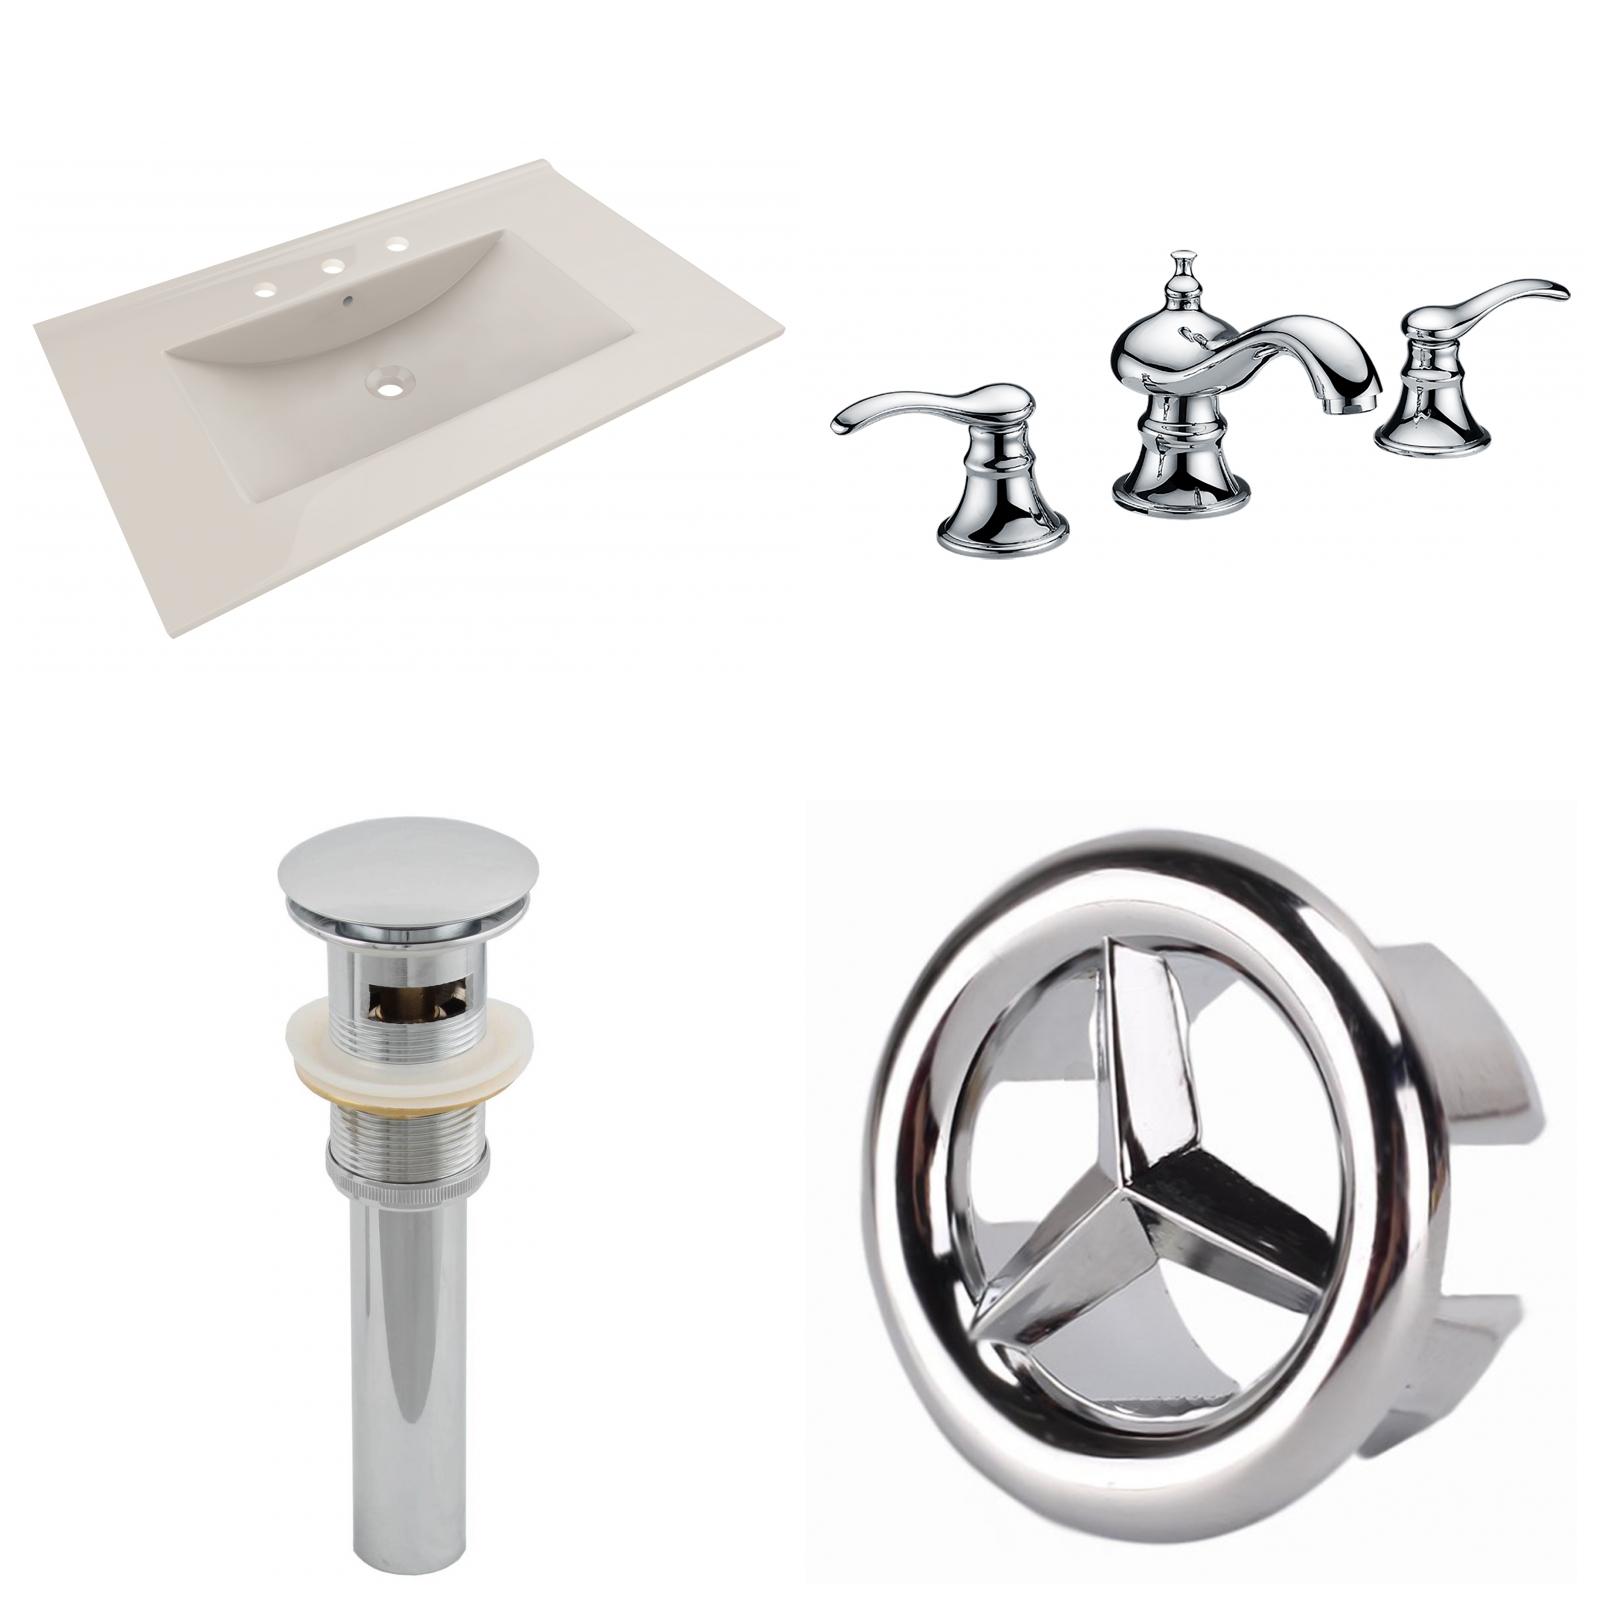 colored bathroom decor gold ideas bath design accessories lead room new to brass how decorate